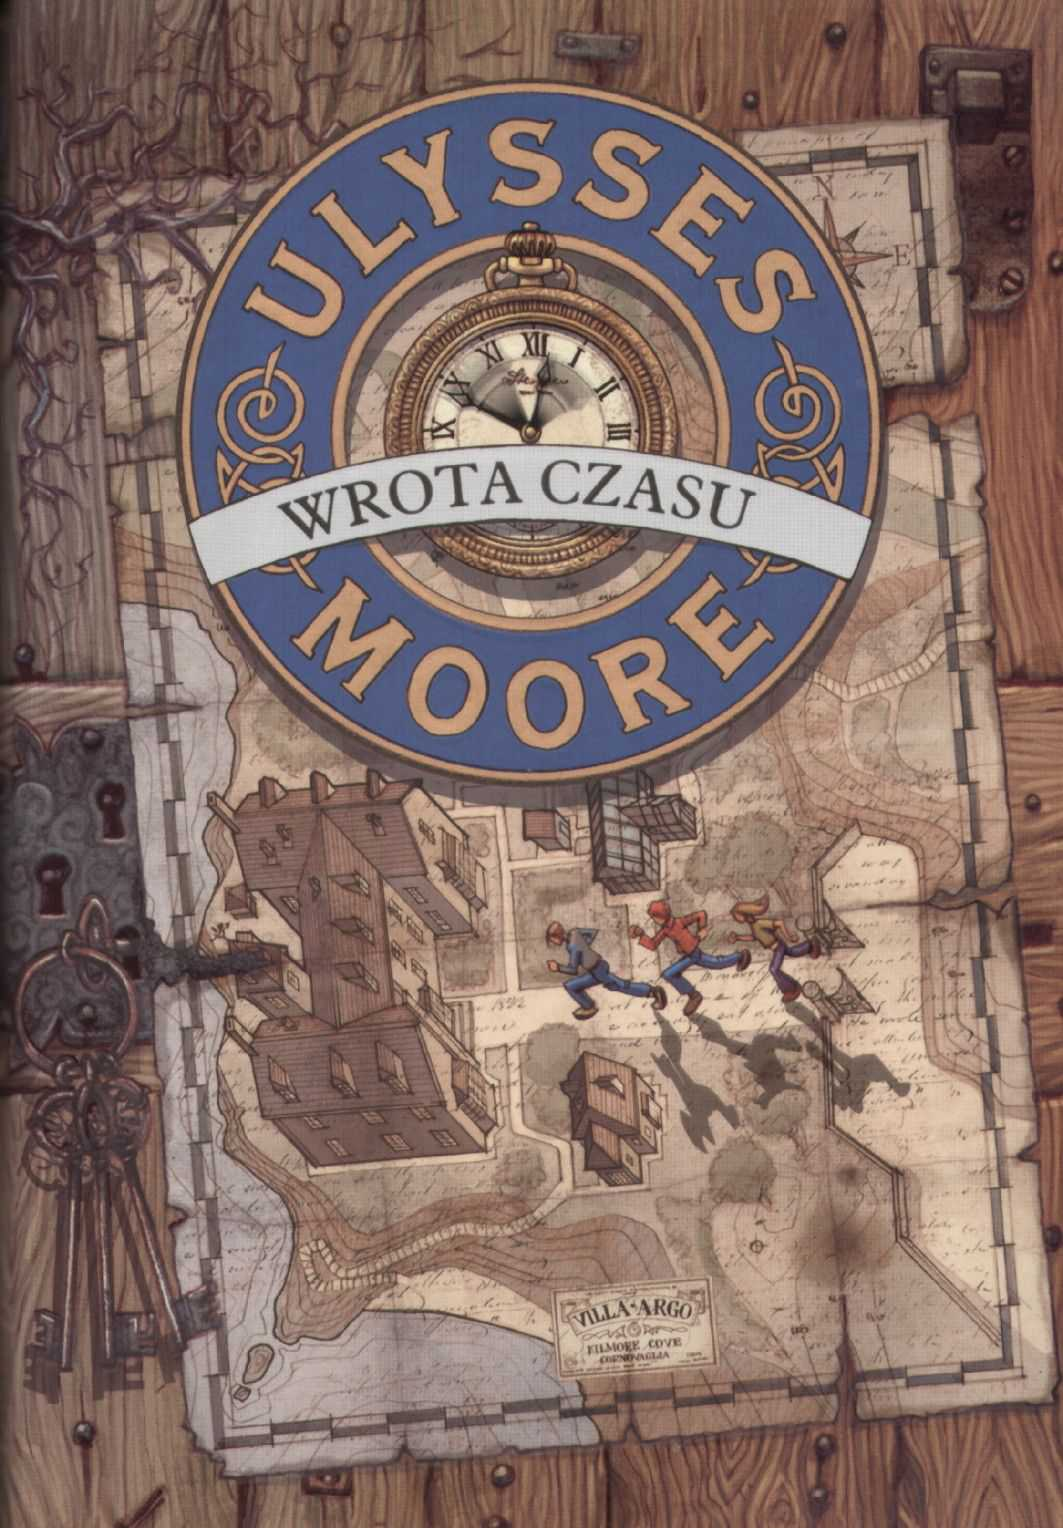 Ulysses Moore. Tom 1. Wrota czasu - Ebook (Książka EPUB) do pobrania w formacie EPUB